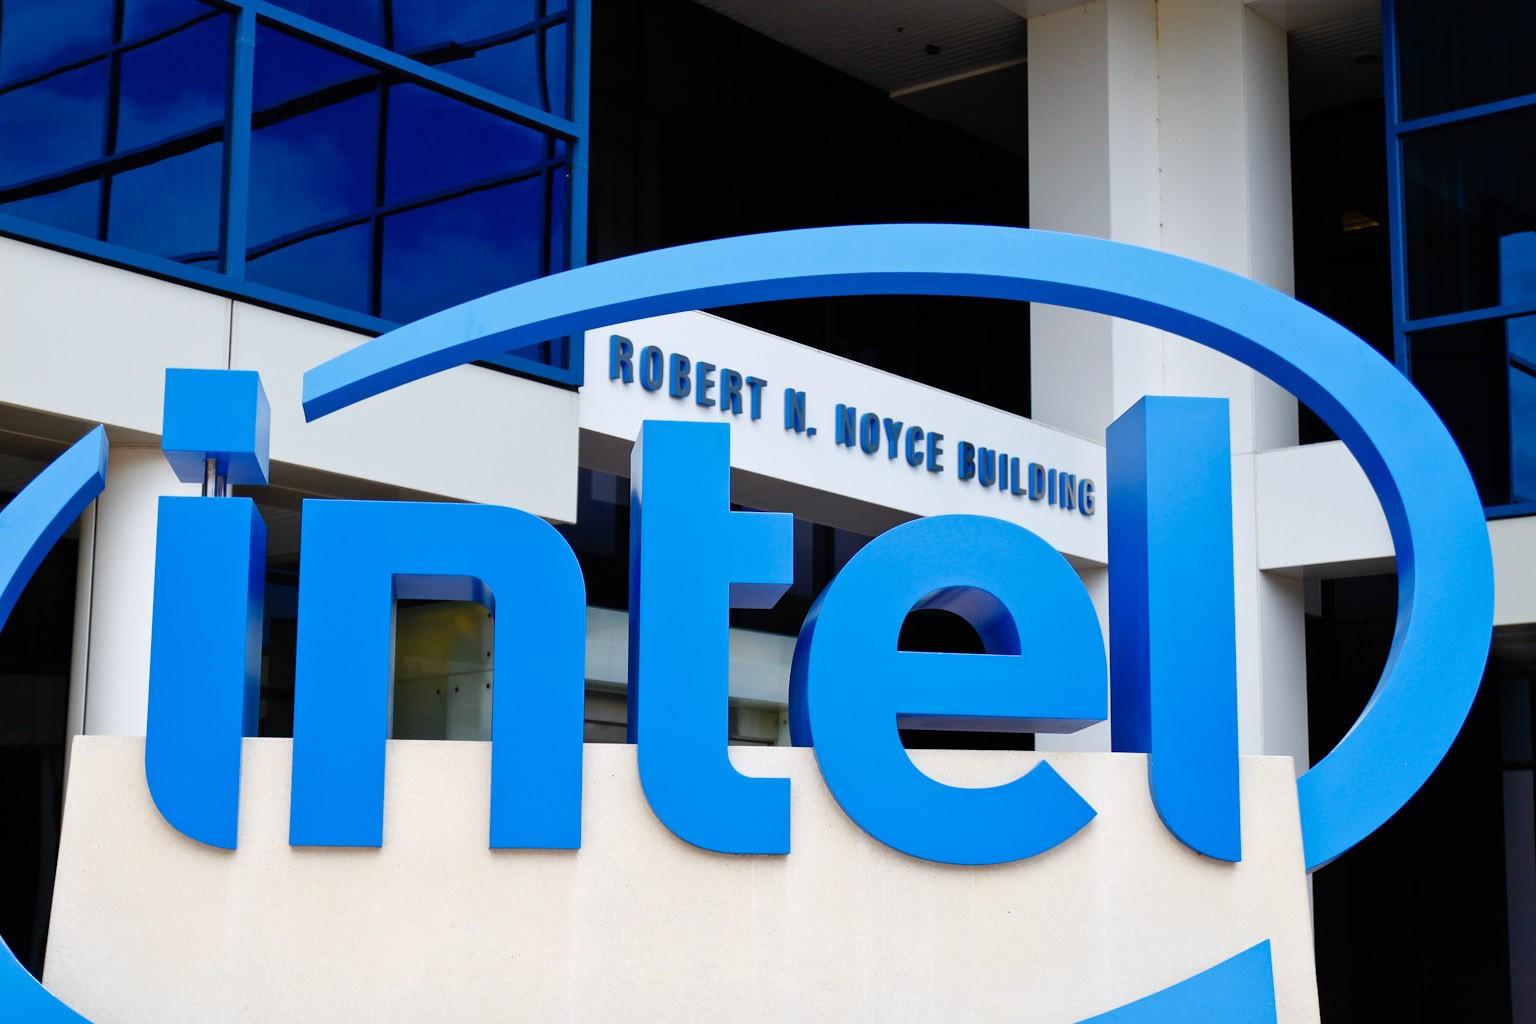 General 1536x1024 Intel company CPU technology building logo